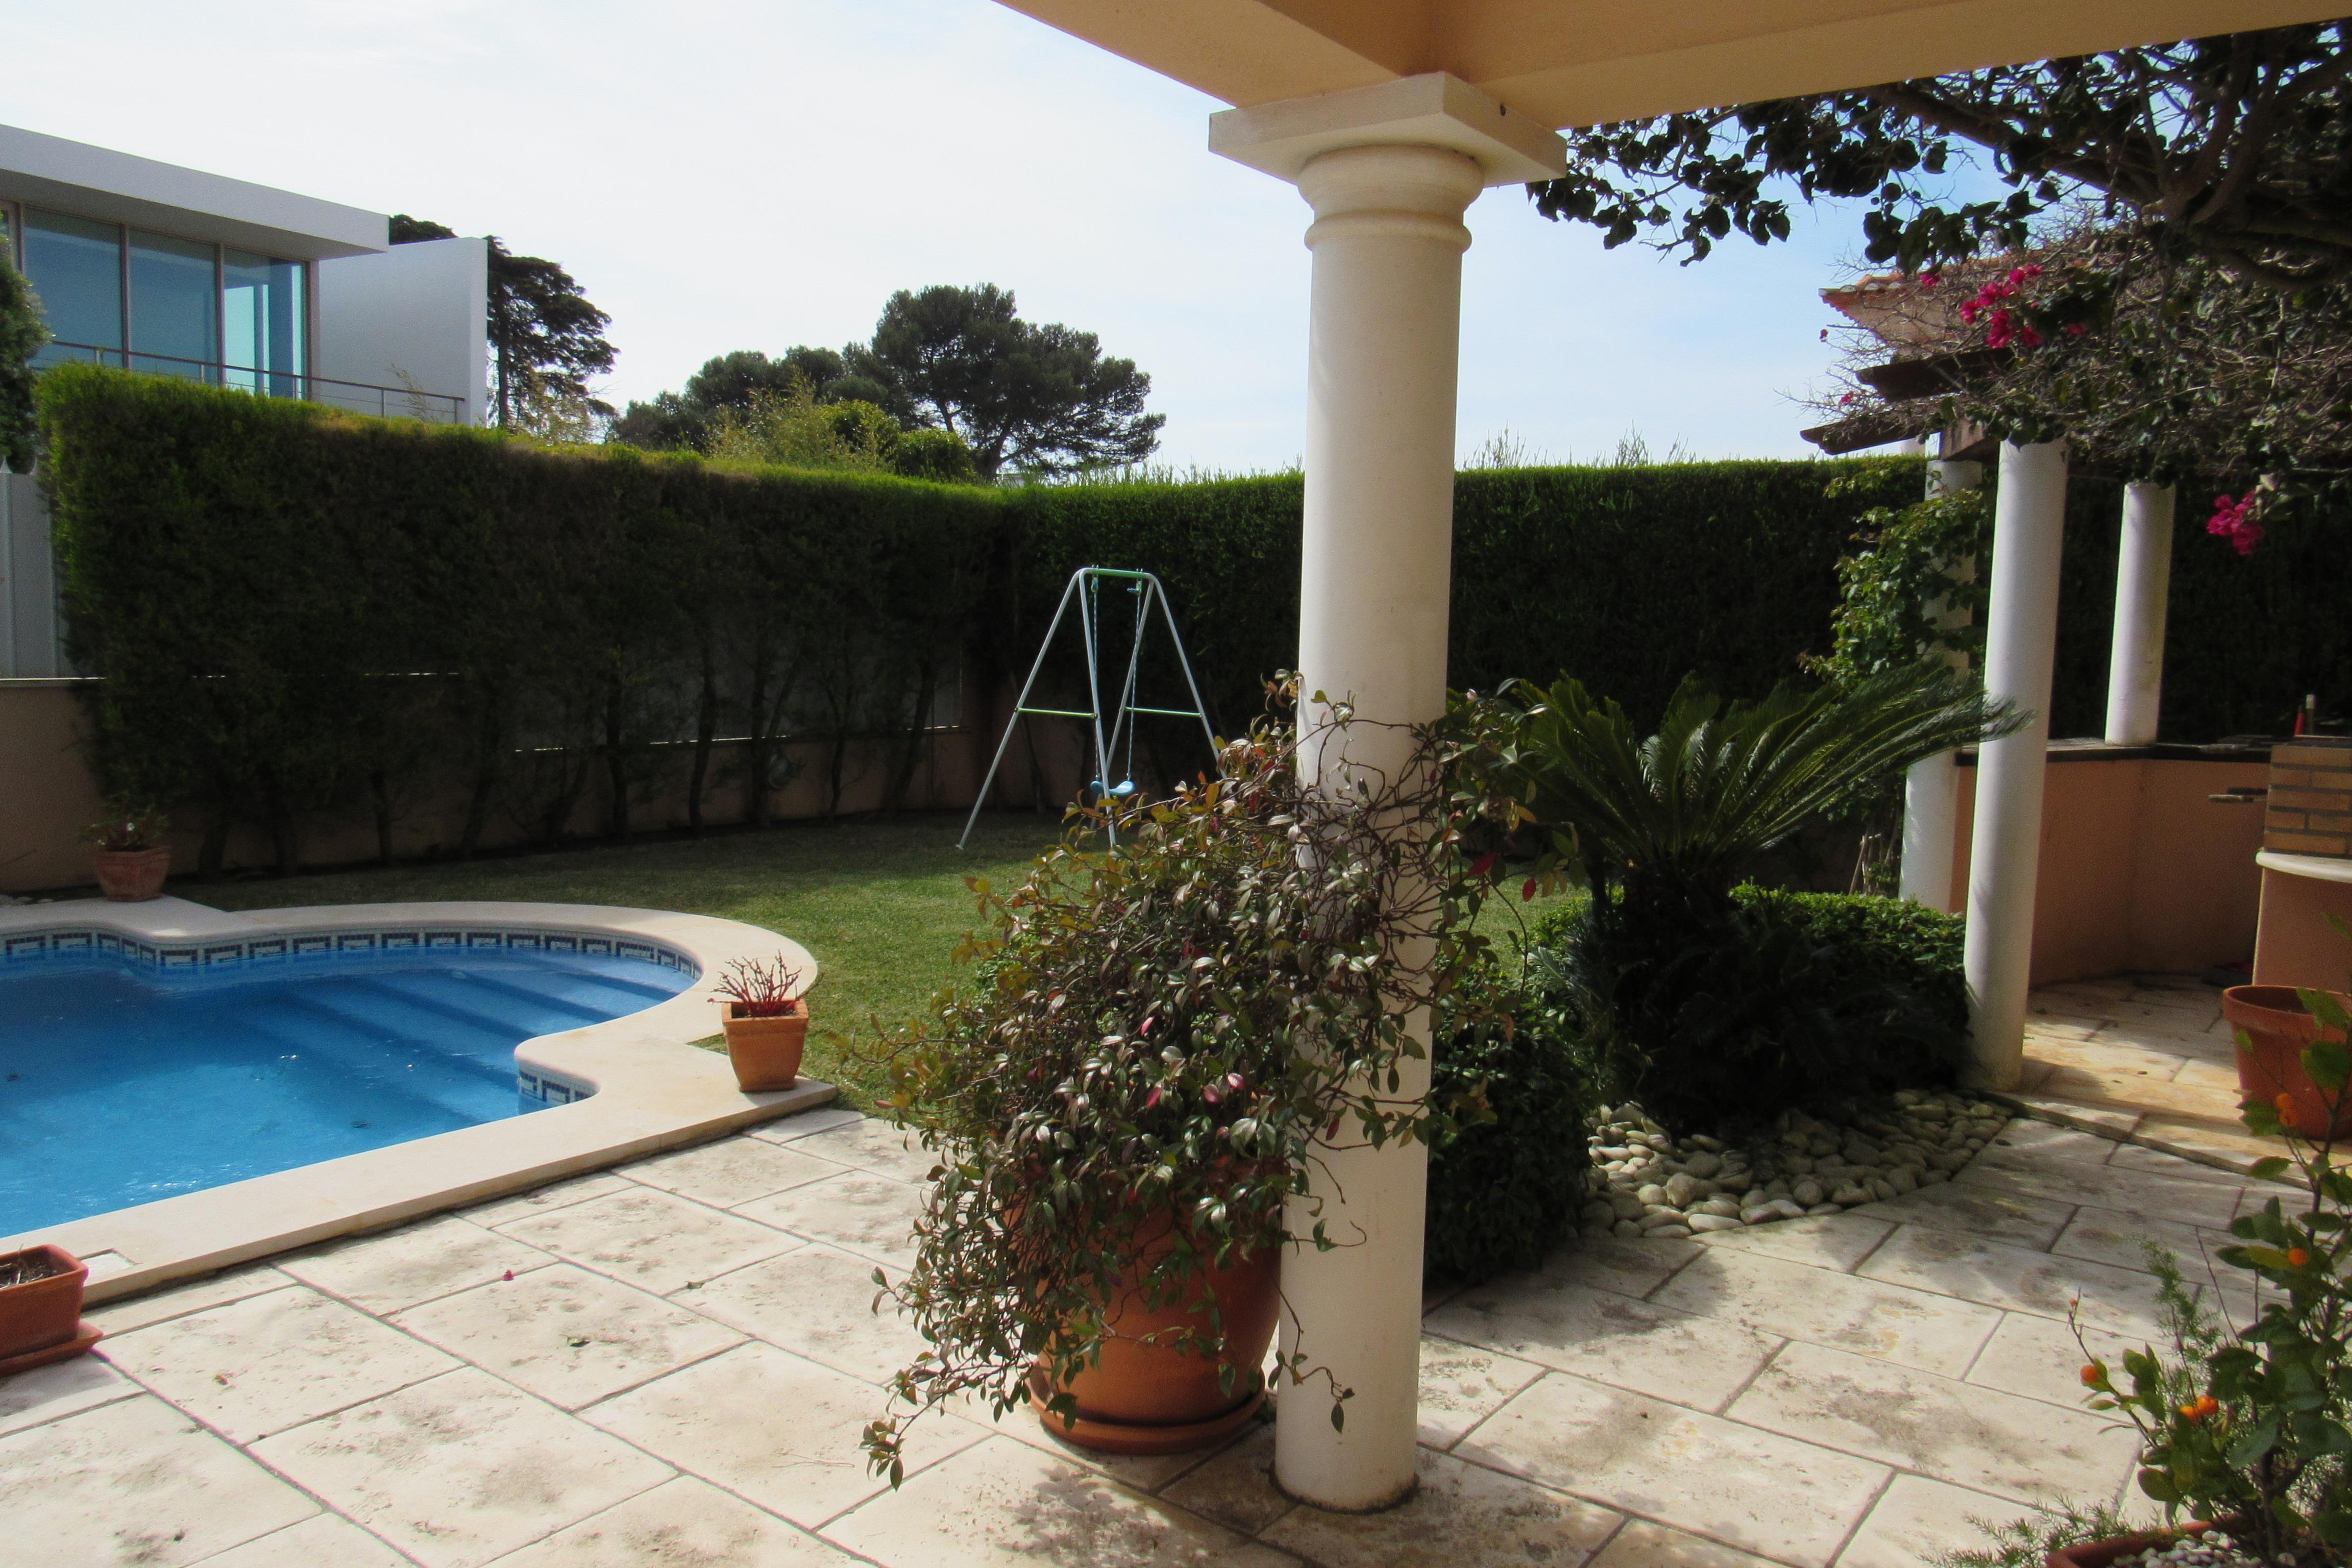 独户住宅 为 销售 在 Detached house, 5 bedrooms, for Sale 卡斯凯什, 葡京, 2750-210 葡萄牙